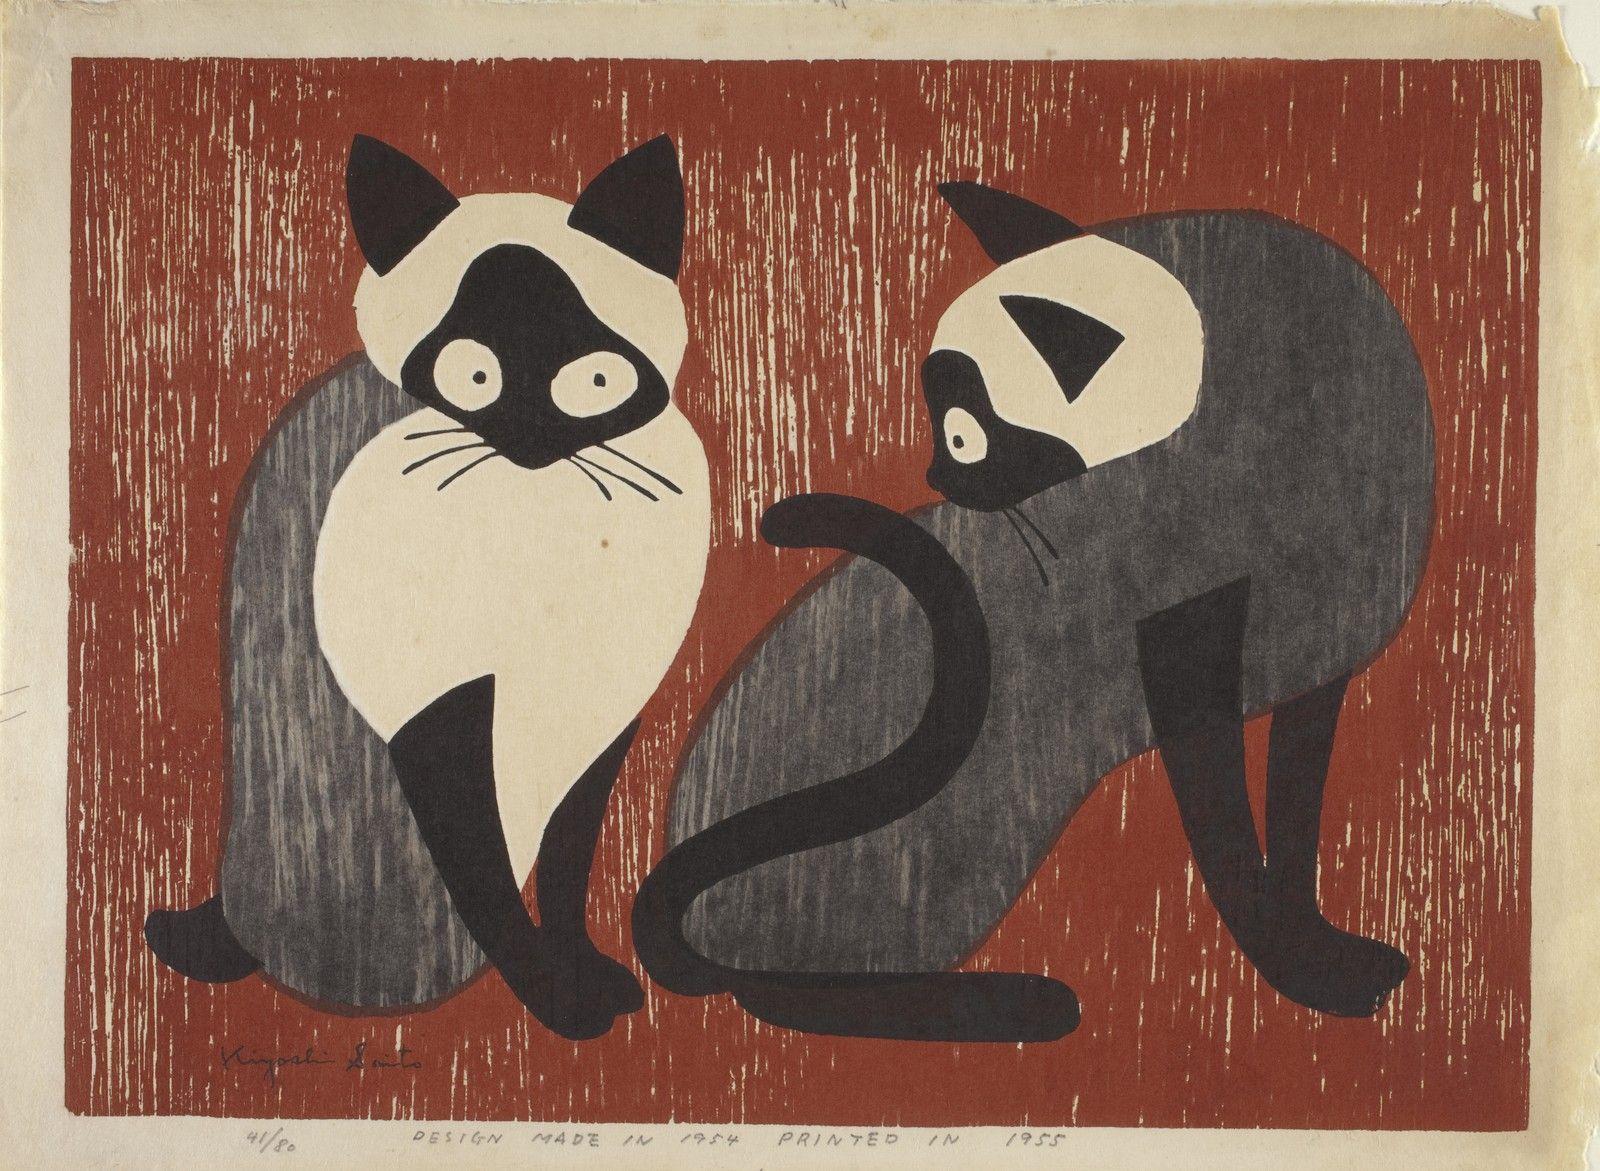 Two Cats |  Saito Kiyoshi | Japanese | 1907-1997, creation date 1955